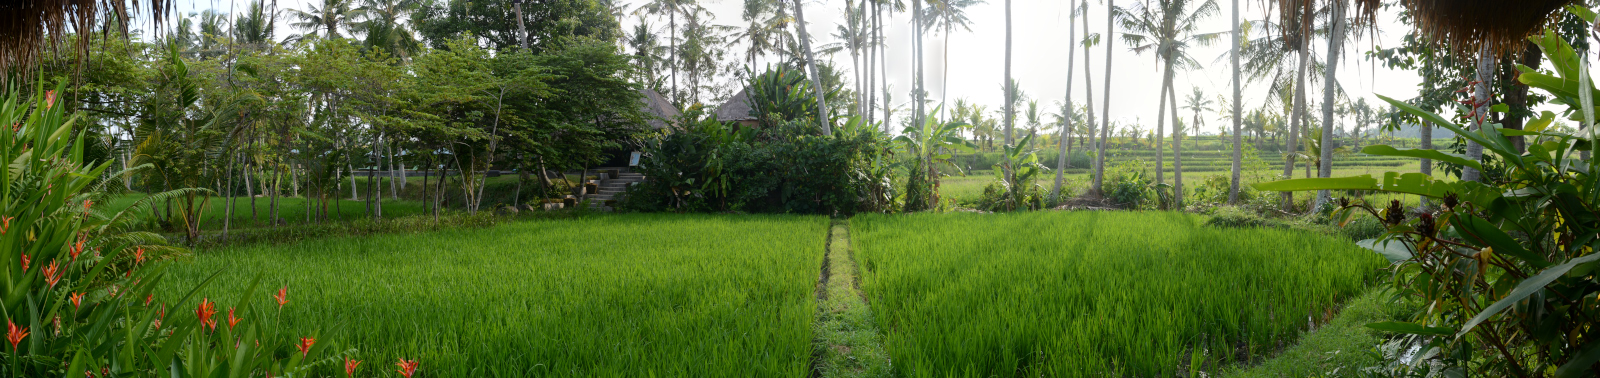 Enjoy Indonesia Tours © Jean-Pierre Pariset